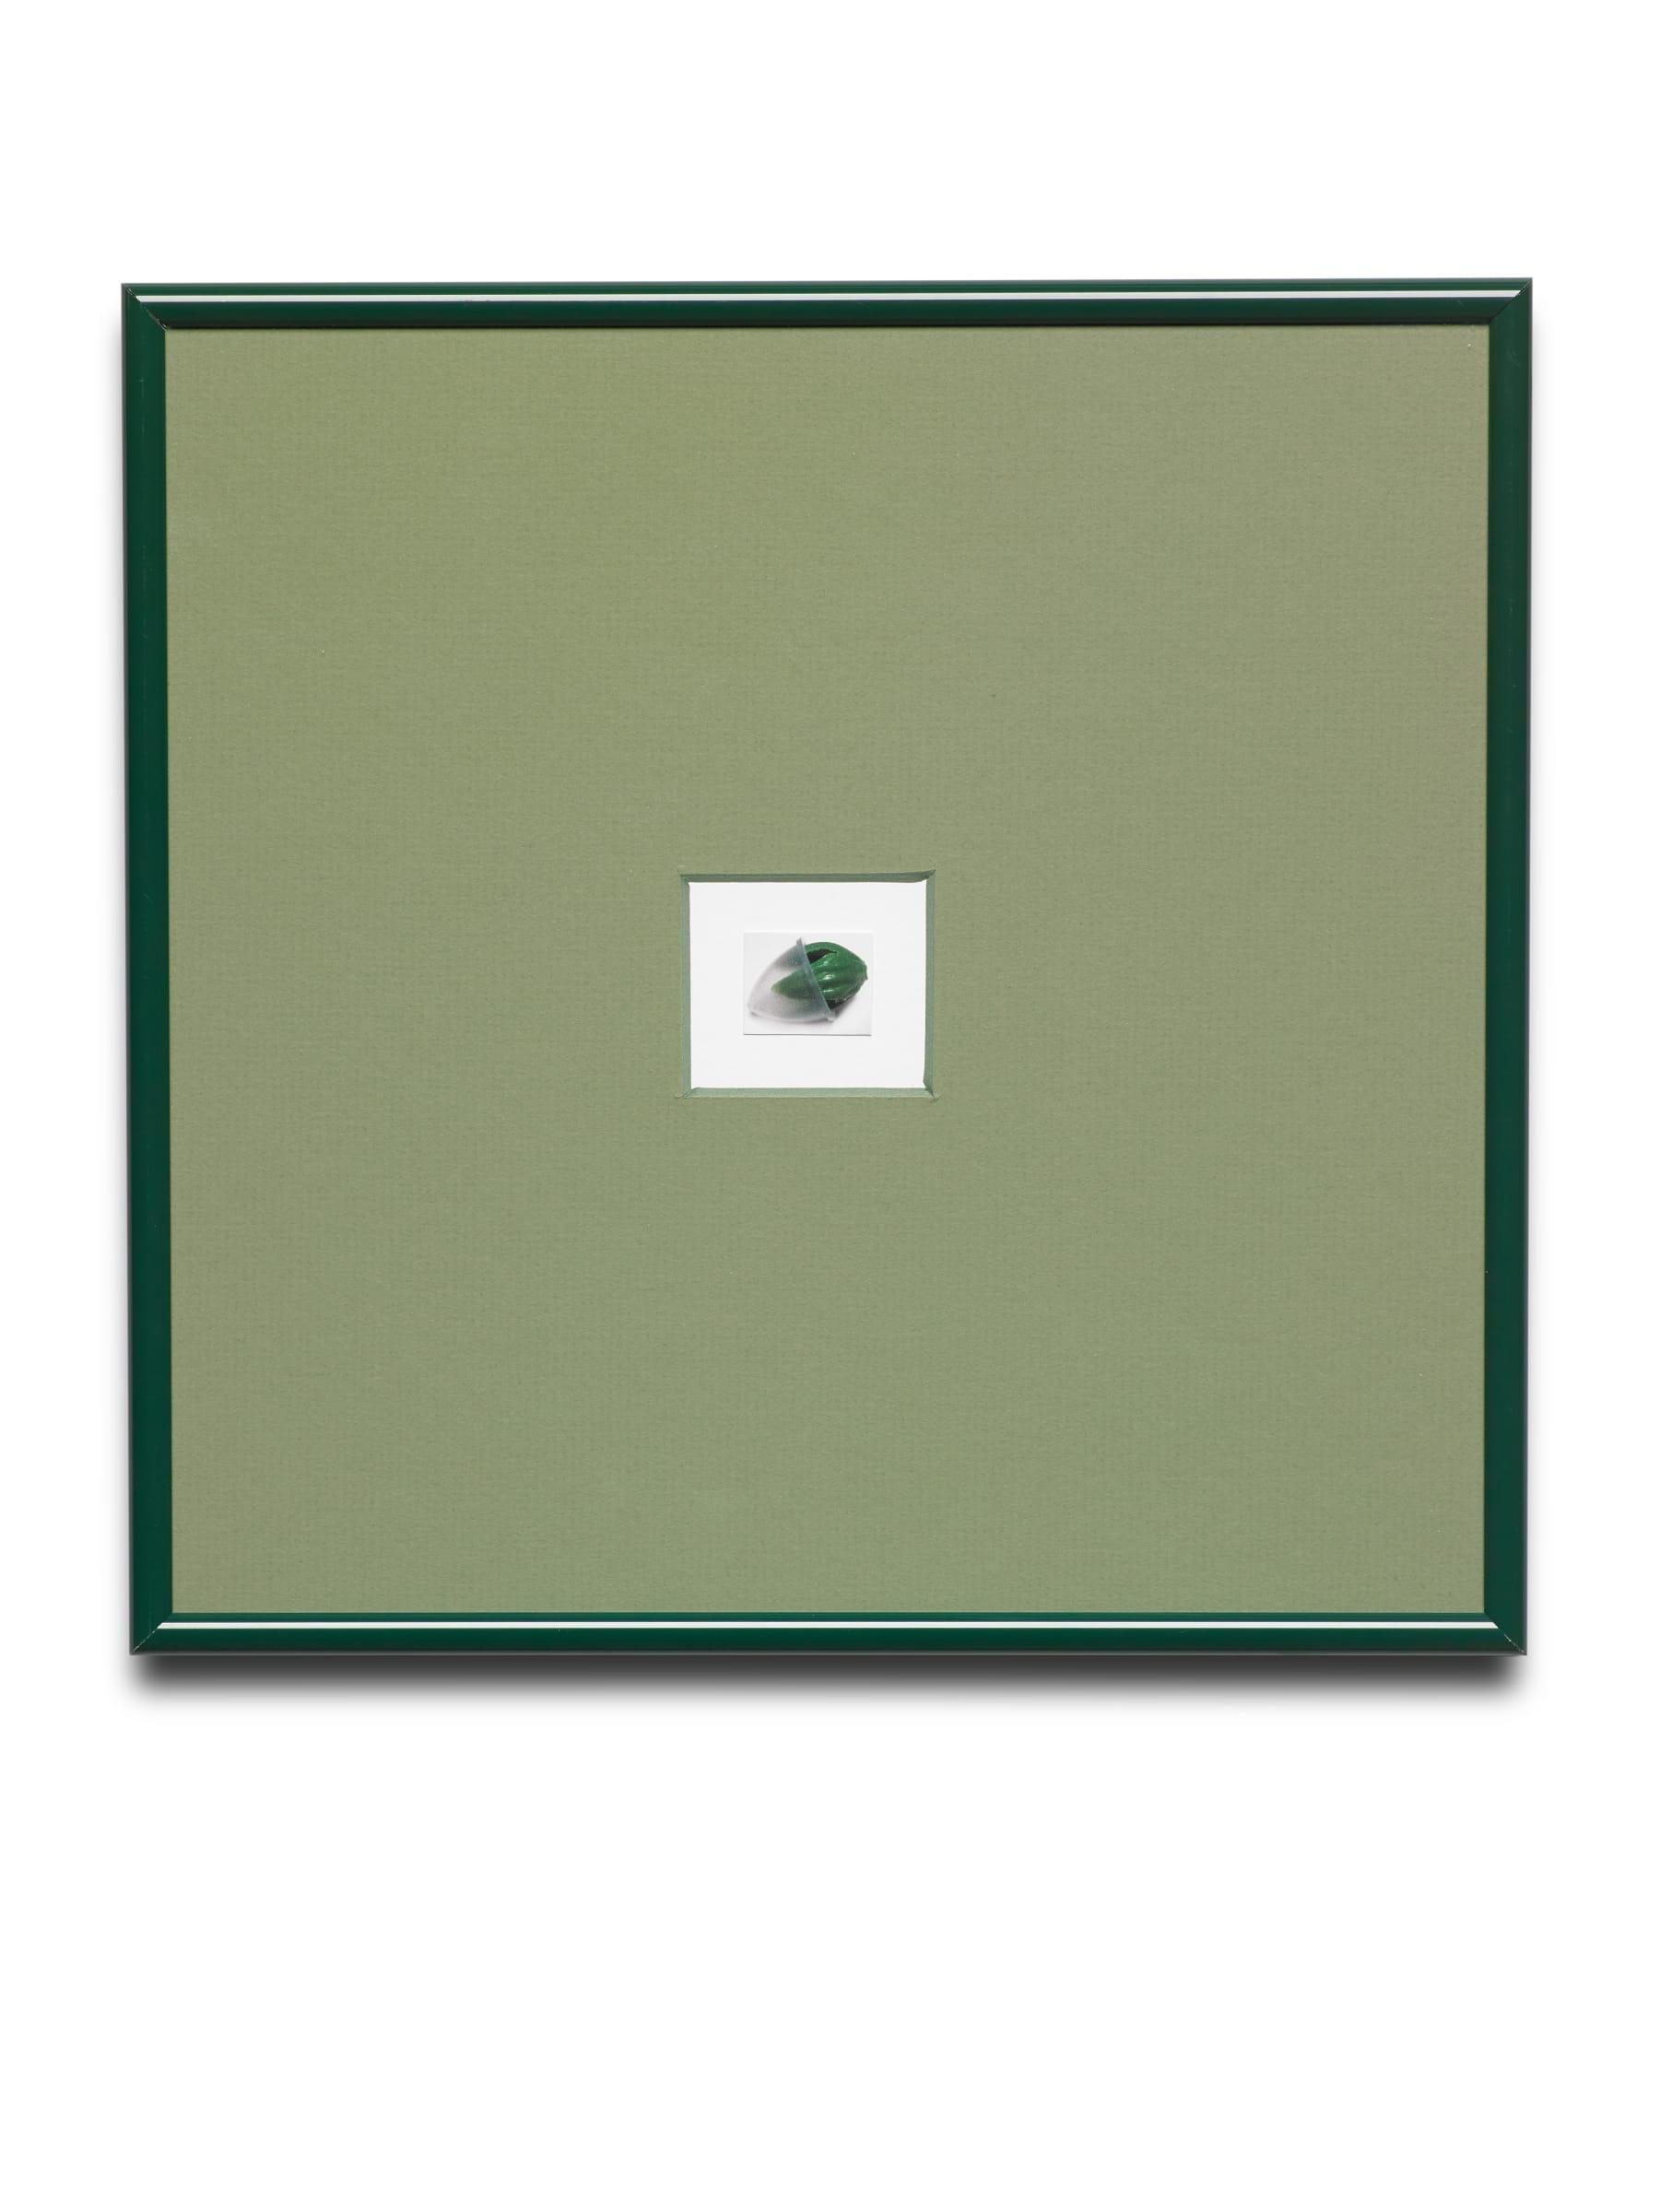 "<span class=""link fancybox-details-link""><a href=""/artists/131-hildigunnur-birgisdottir/works/15504/"">View Detail Page</a></span><div class=""artist""><strong>HILDIGUNNUR BIRGISDÓTTIR</strong></div> <div class=""title""><em>Untitled</em>, 2011</div> <div class=""medium"">laser print</div> <div class=""dimensions"">2,5 x 3 cm<br /> framed: 29 x 29,5 cm<br /> 0.9 x 1.2 in<br /> framed: 11.4 x 11.6 in</div> <div class=""edition_details"">Edition 2/6</div><div class=""copyright_line"">Copyright The Artist</div>"